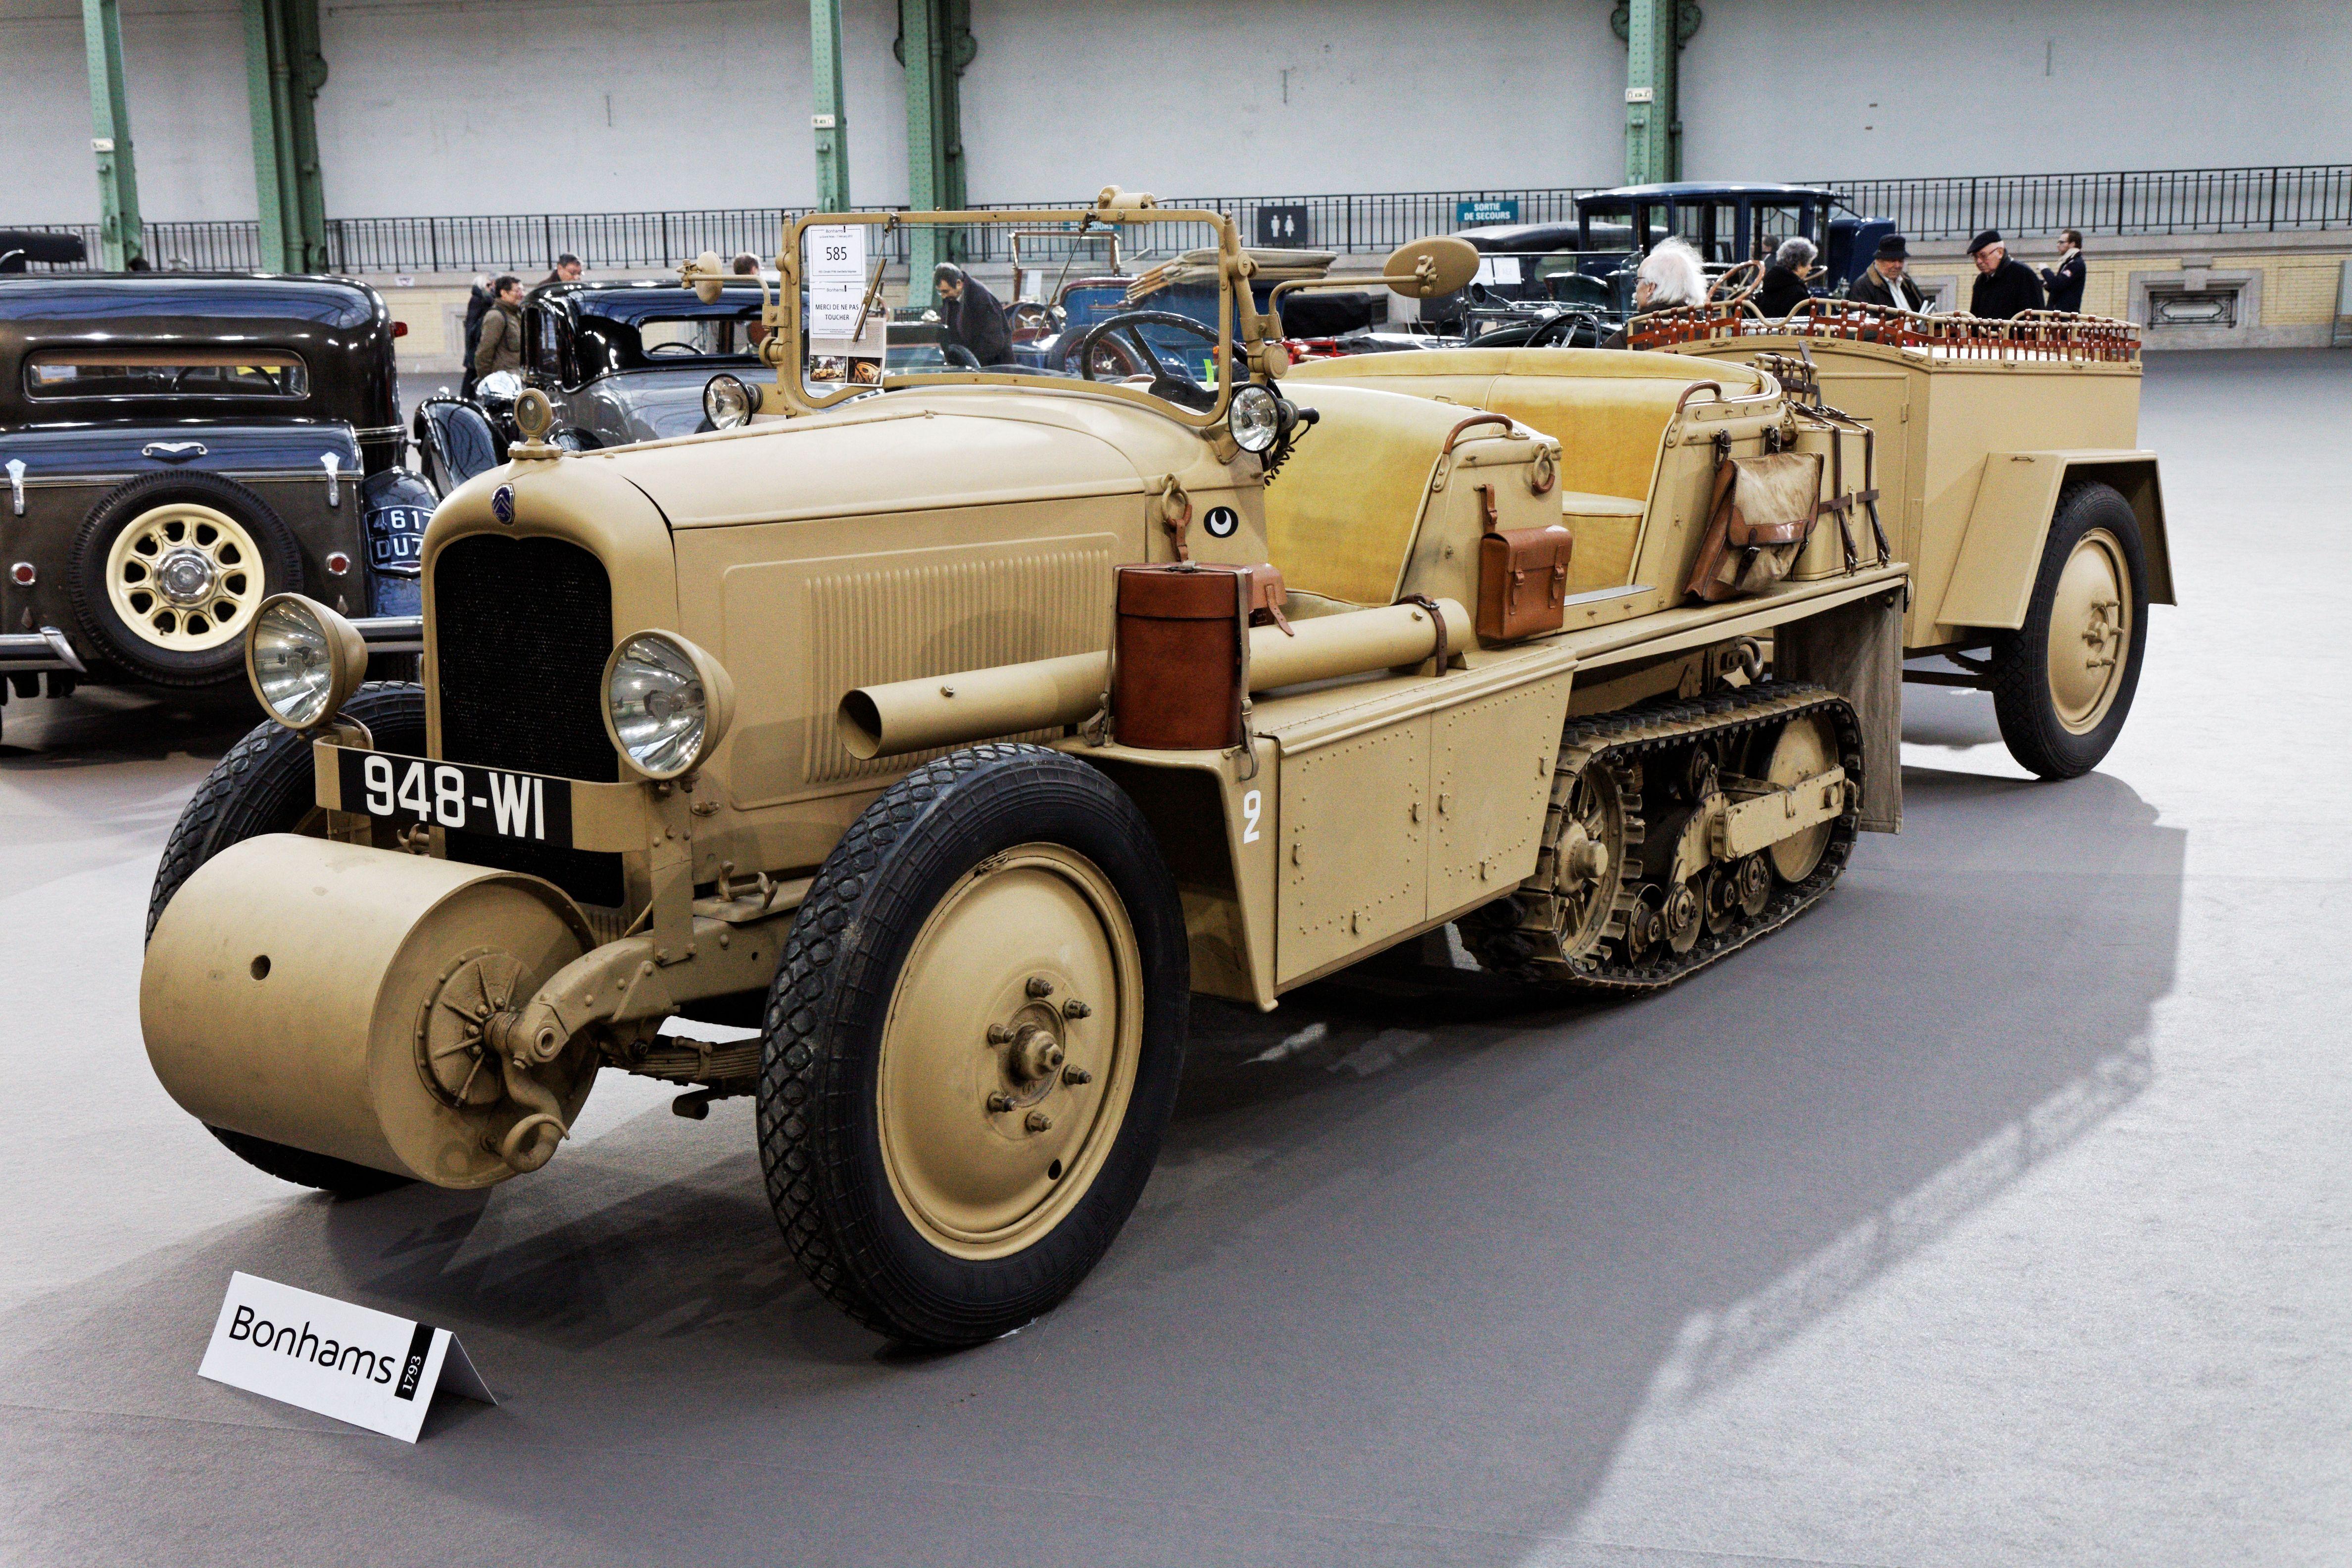 Paris_-_Bonhams_2013_-_Citroën_P19B_chenillette_Kégresse_-_1931_-_004.jpg…